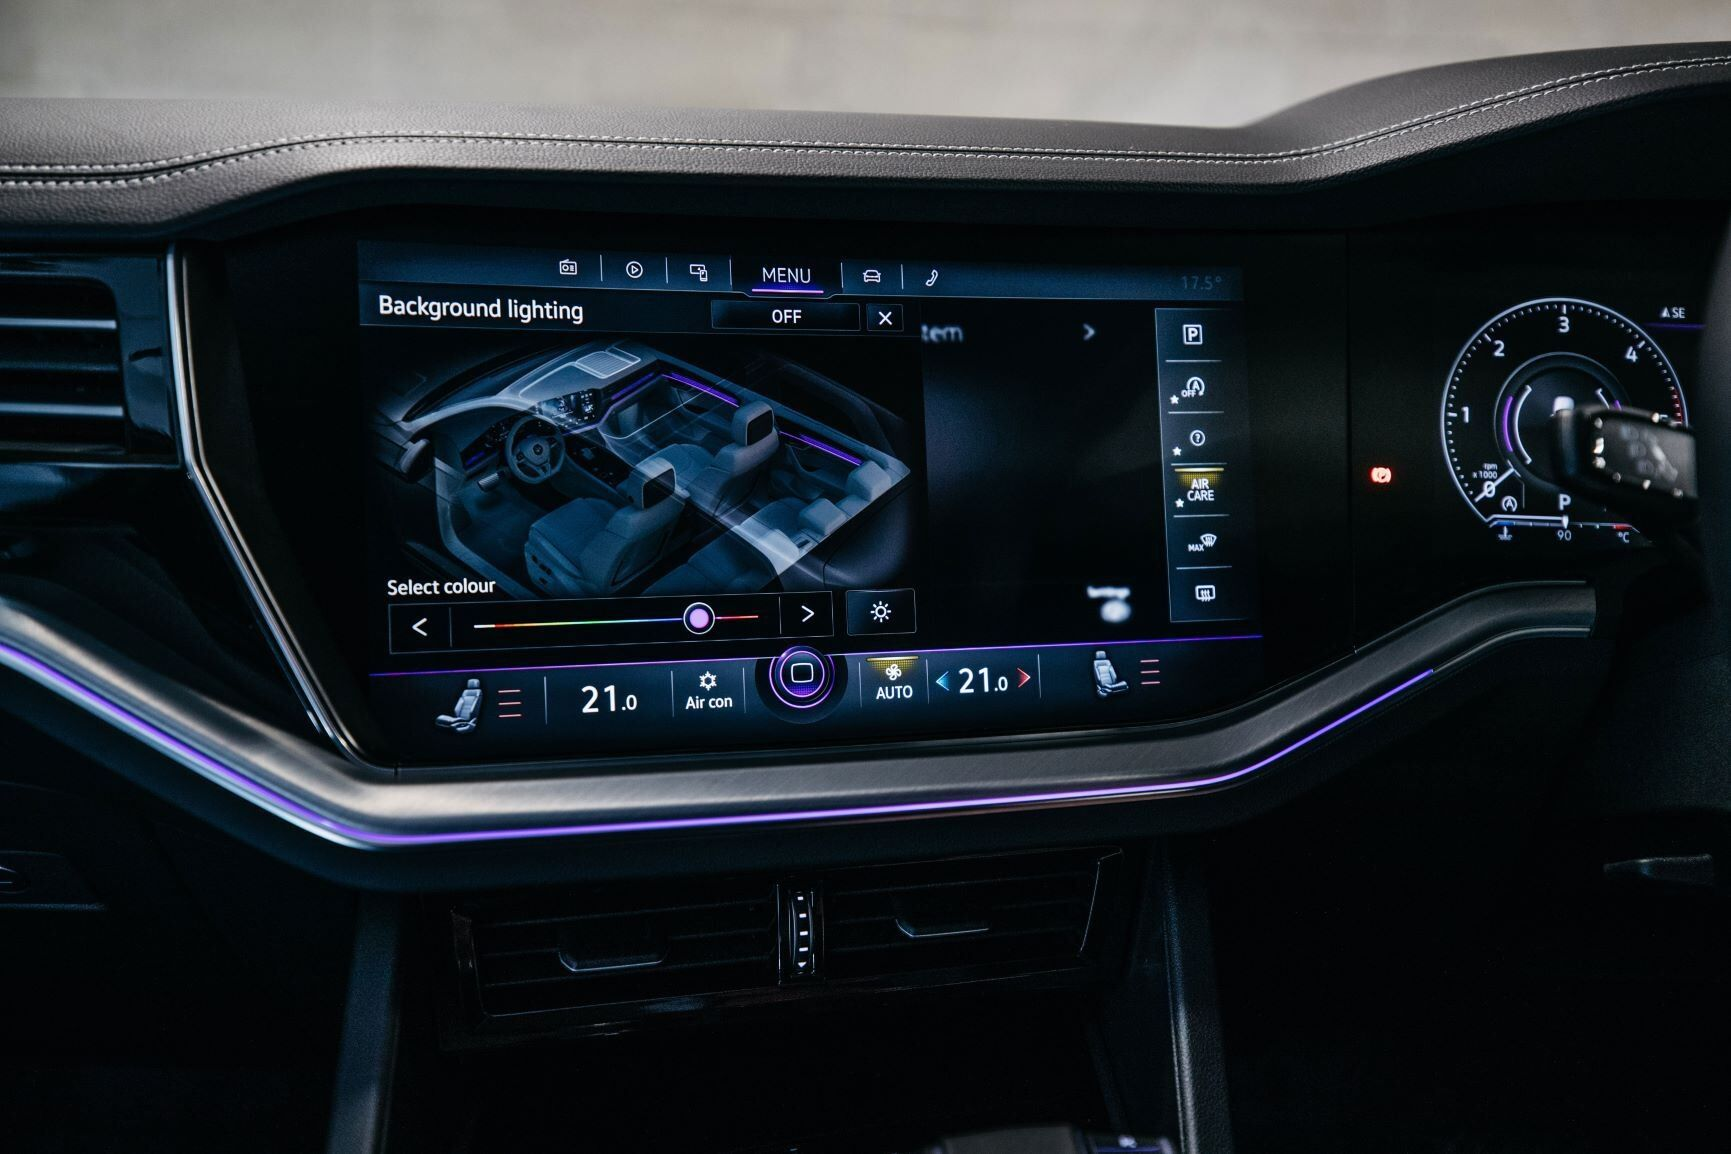 vw touareg interior inovation cockpit